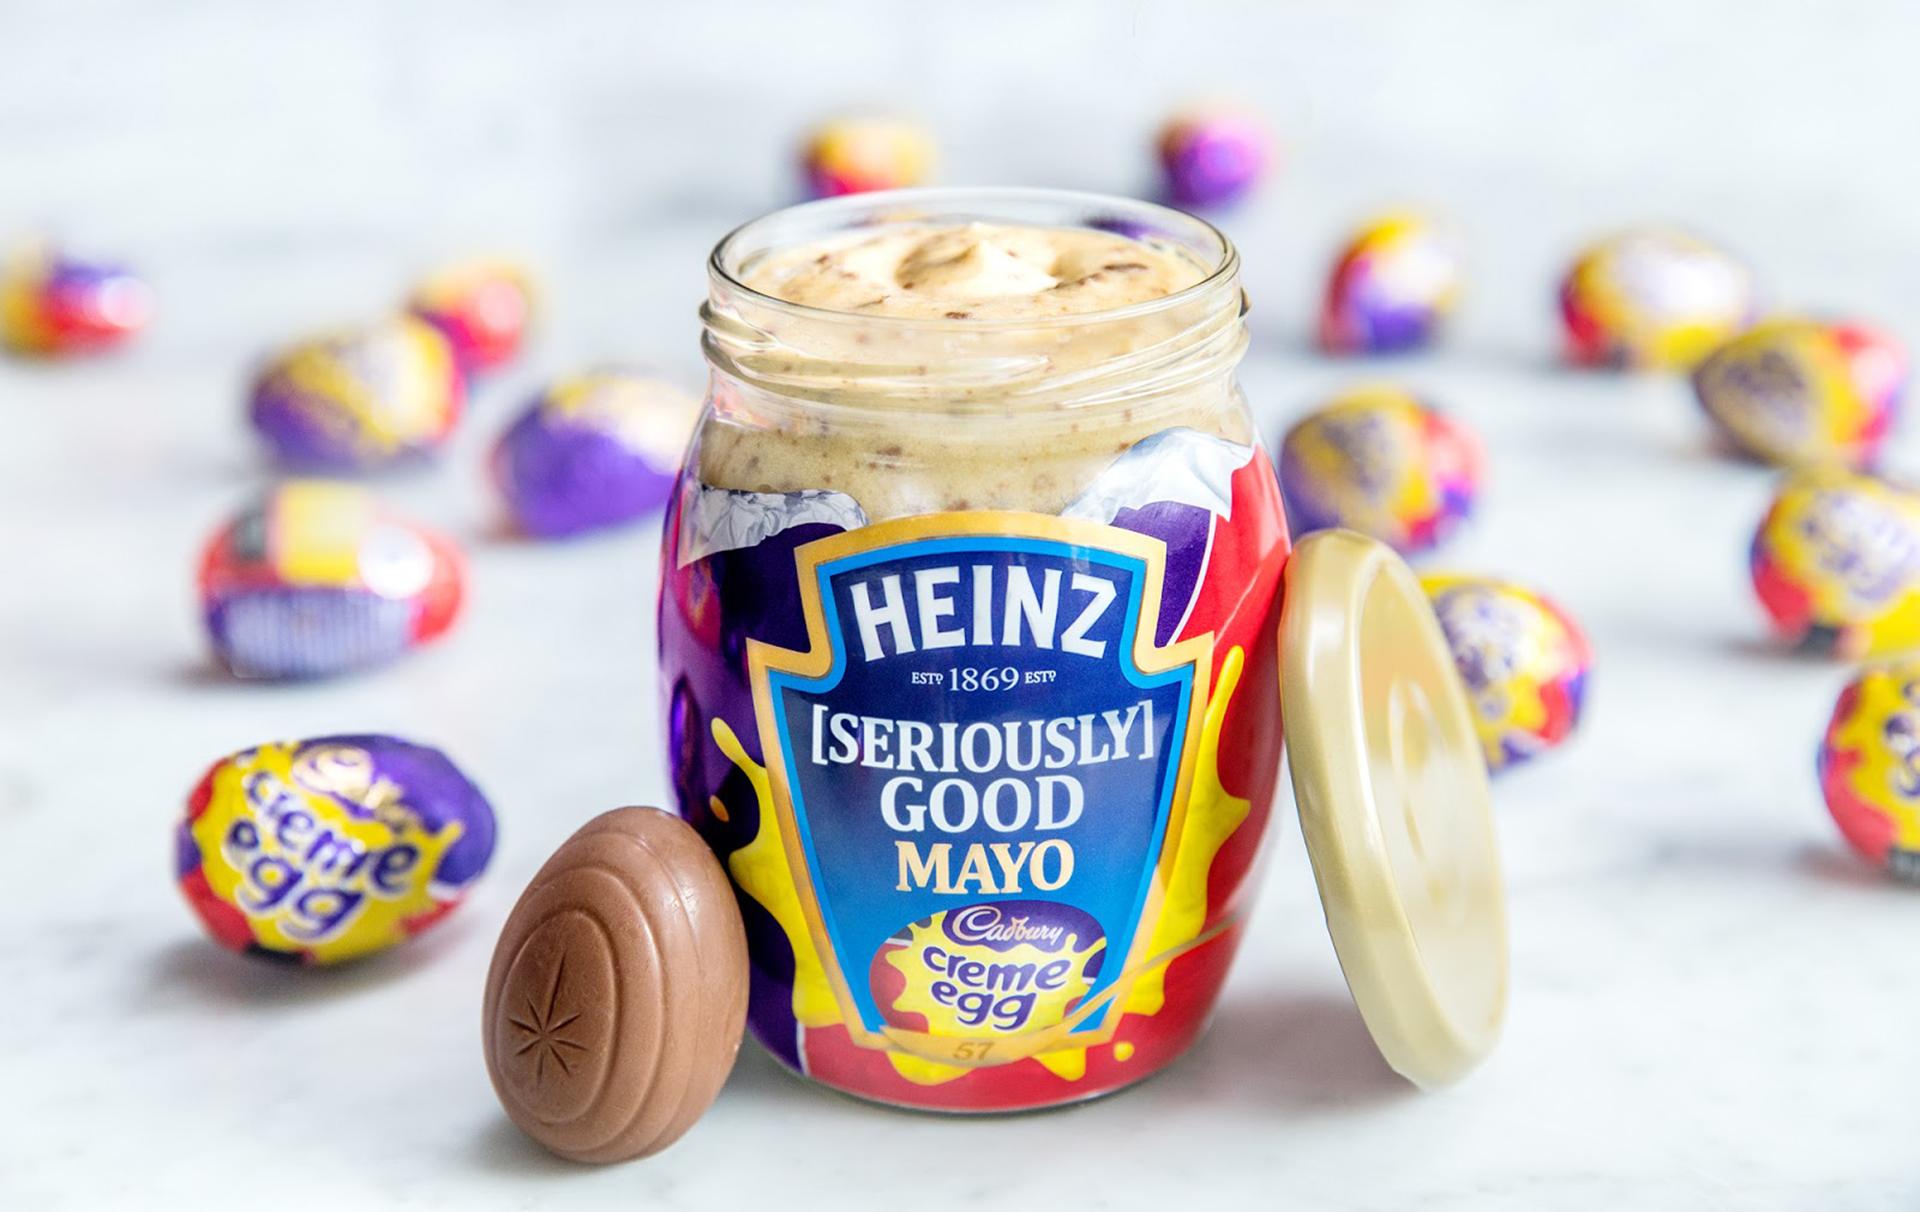 cadbury creme egg flavoured heinz mayonnaise